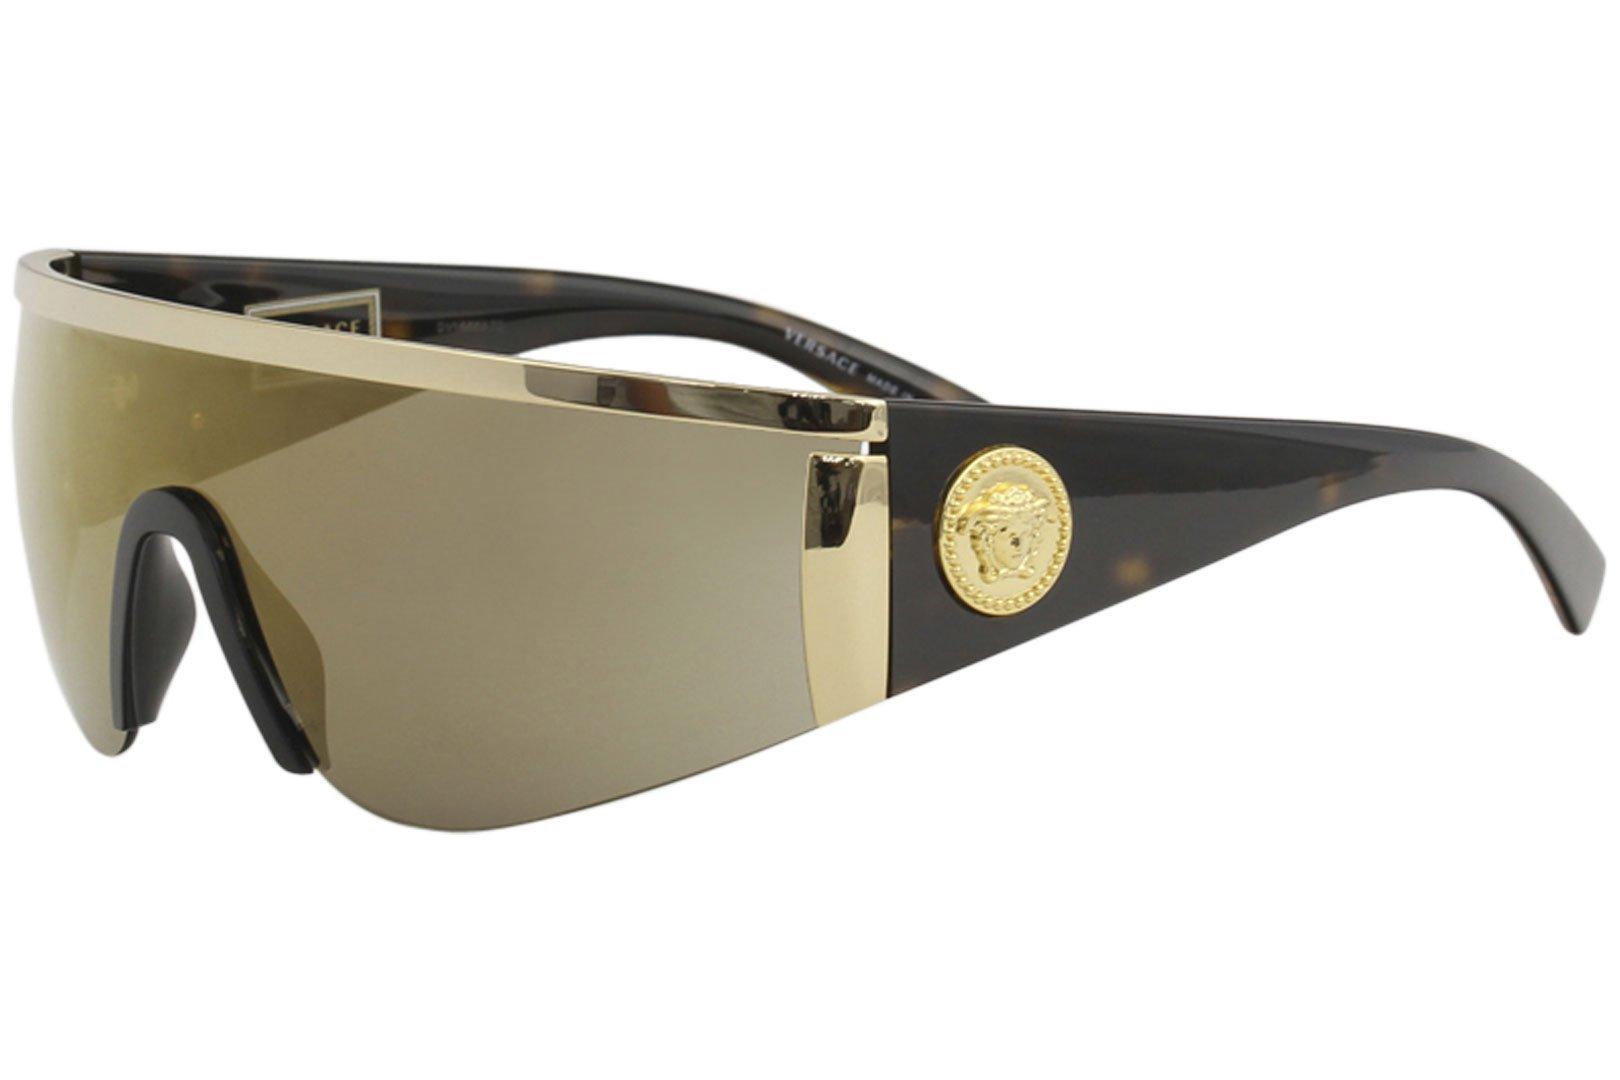 a70f8858a7 Authentic VERSACE Sunglasses VE2197 1000 5A Gold-Havana   Brown ...